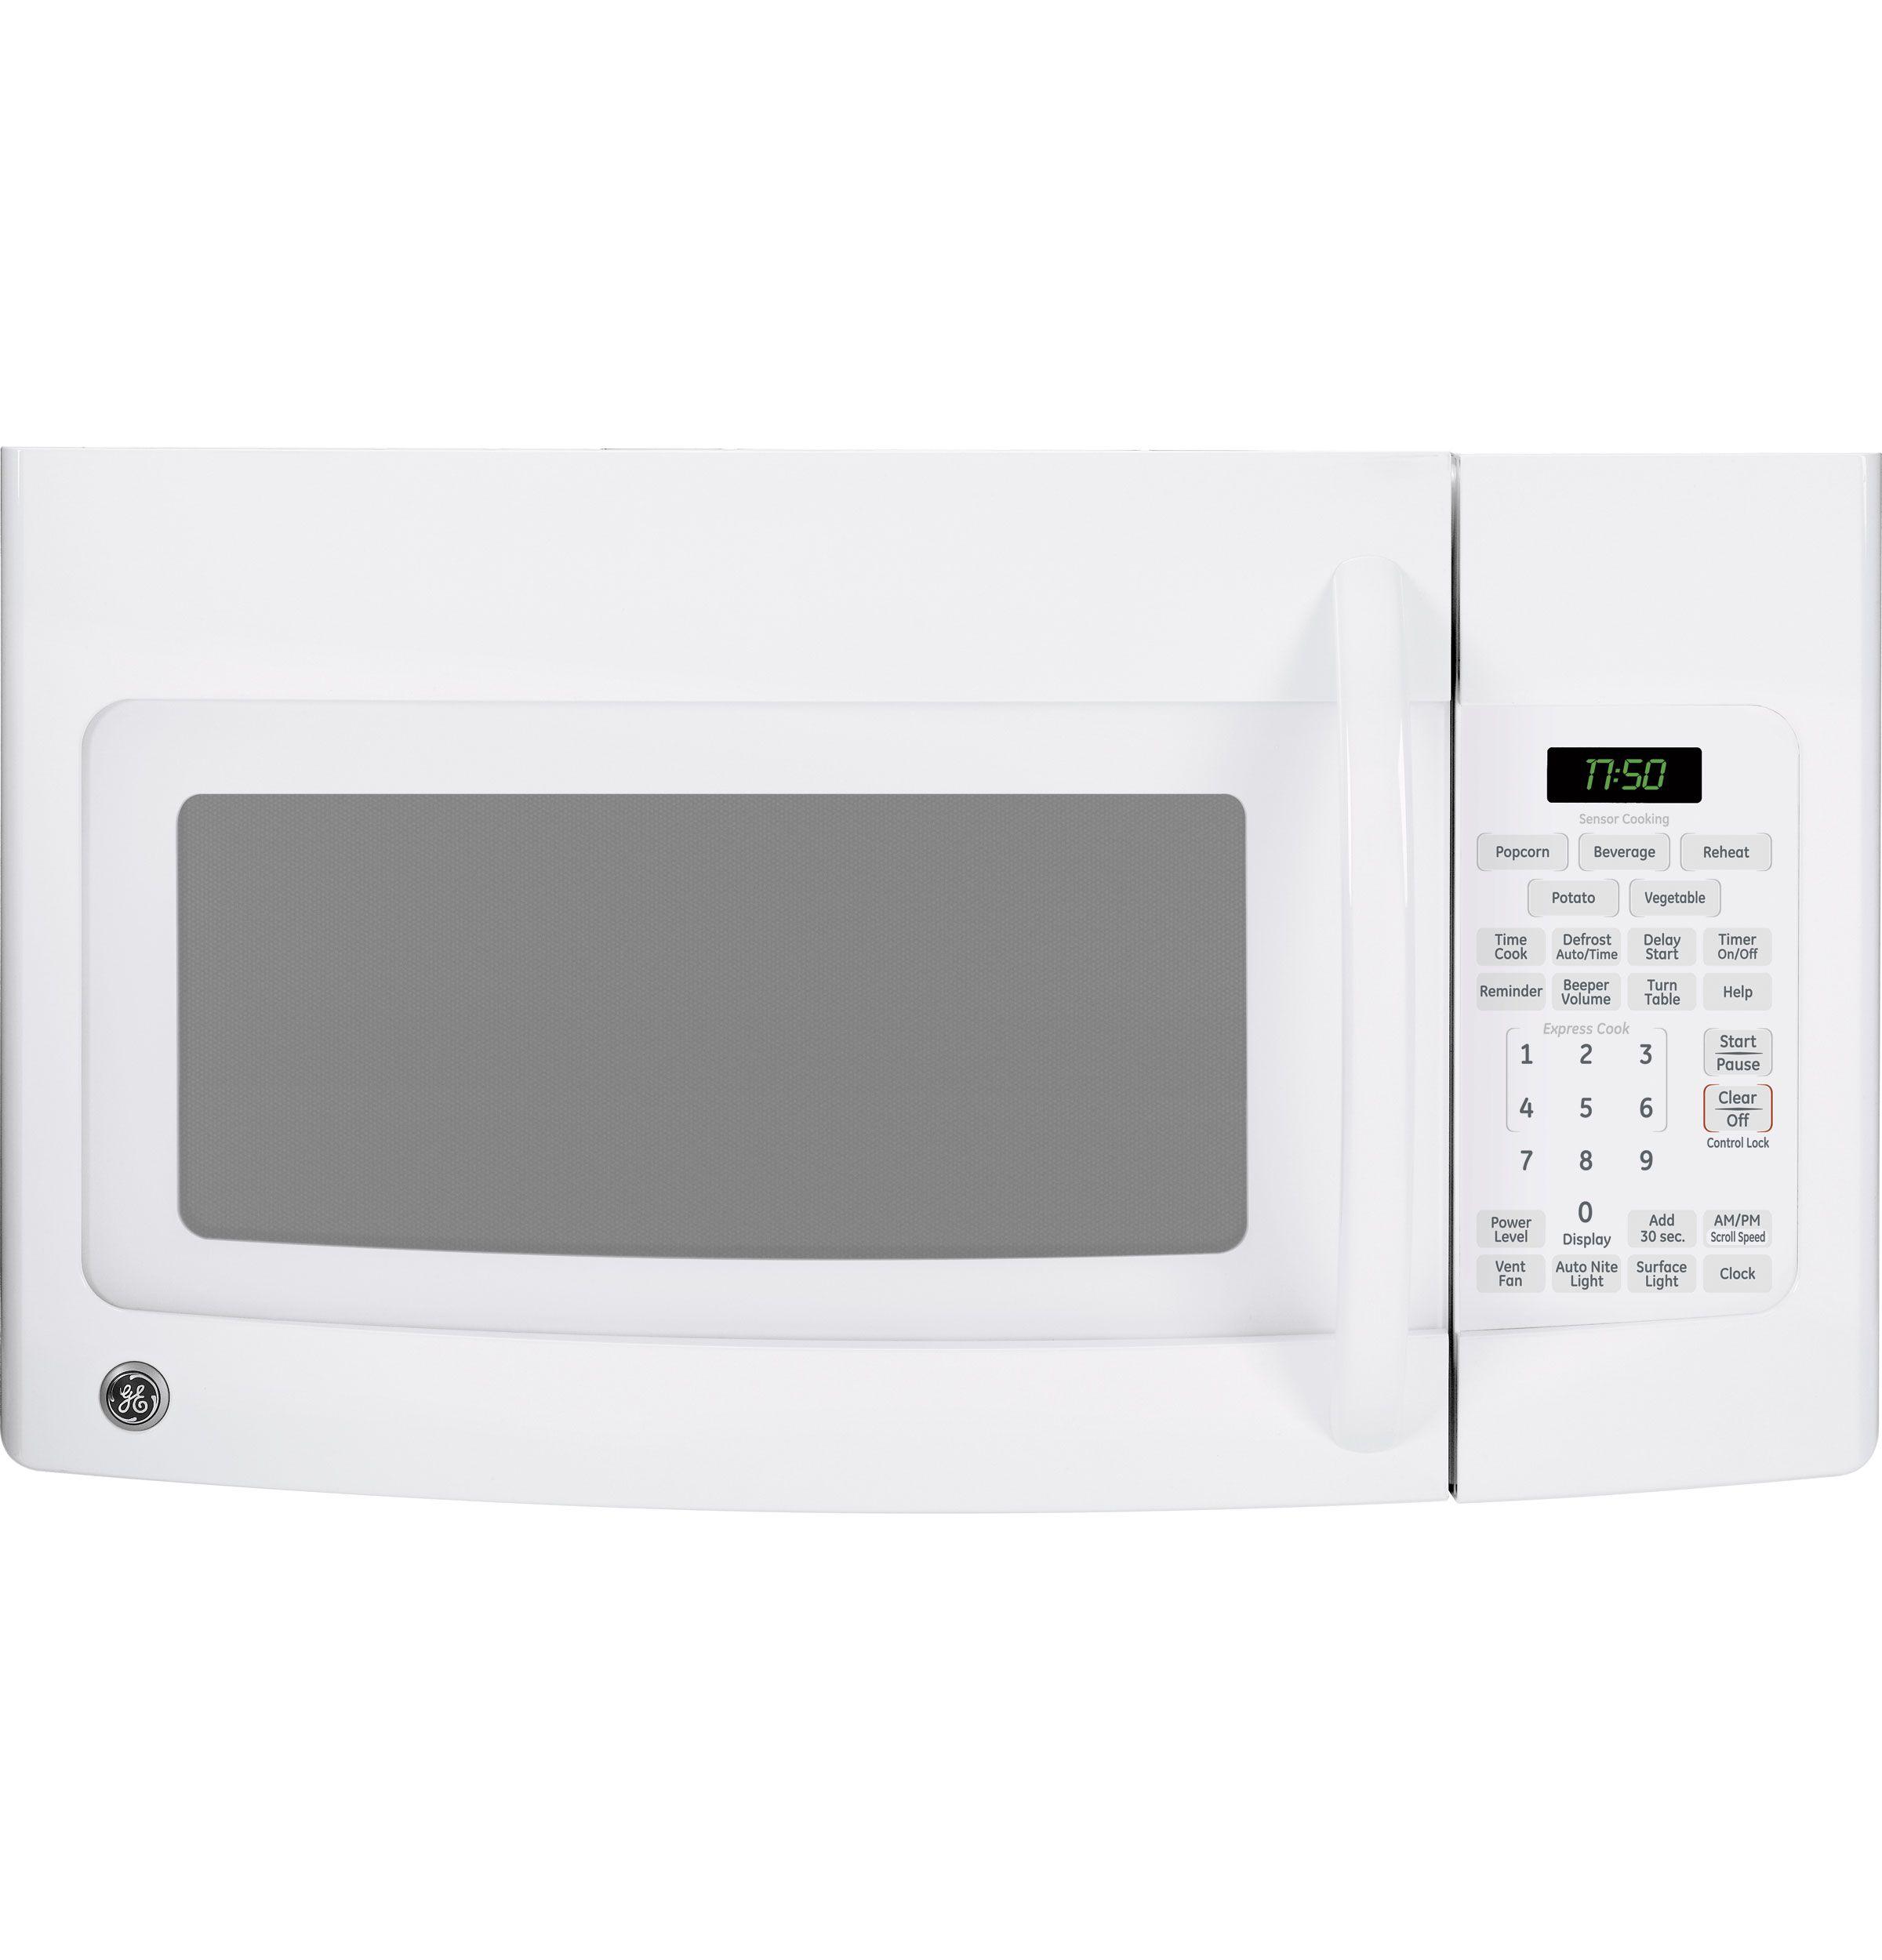 Jvm1750dpww Ge Spacemaker 1 7 Cu Ft Over The Range Sensor Microwave Oven Ge Appliances Over The Range Microwaves Microwave Oven Ge Microwave